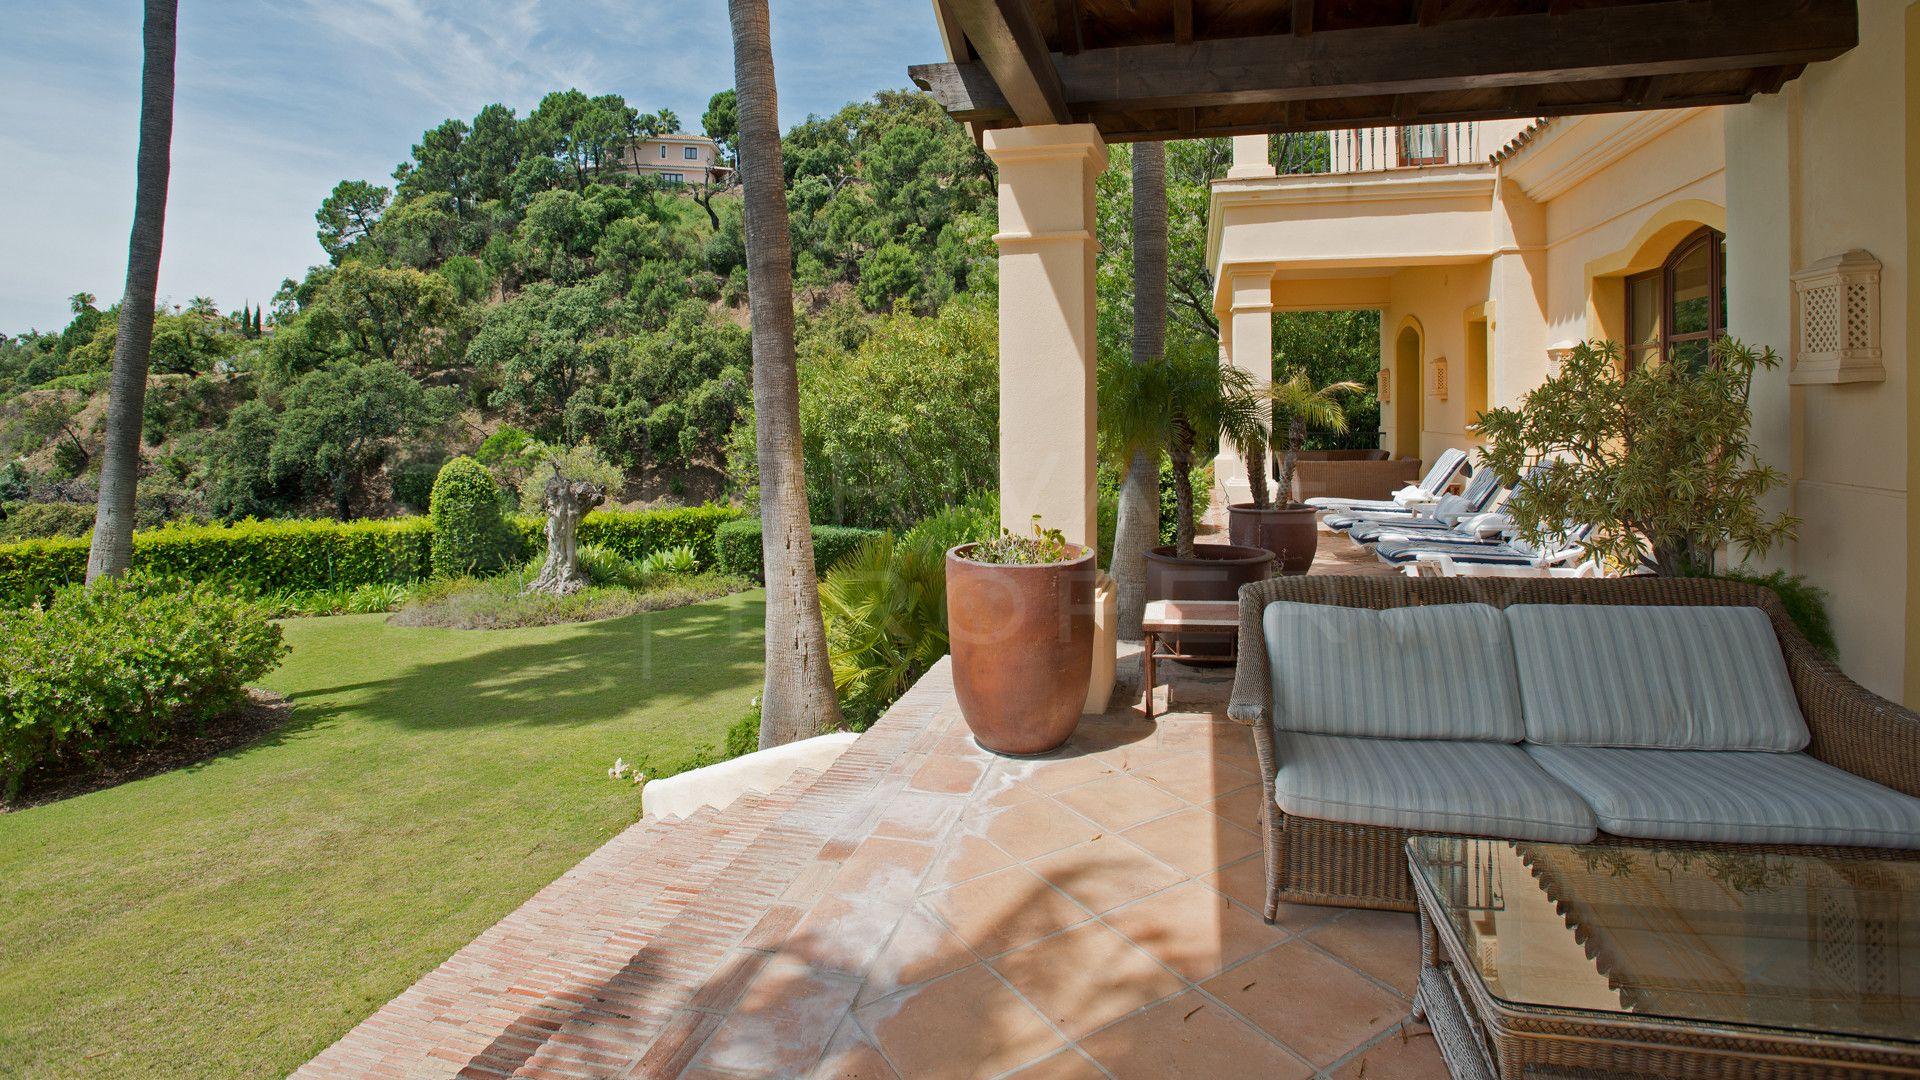 Villa for rent in La Zagaleta